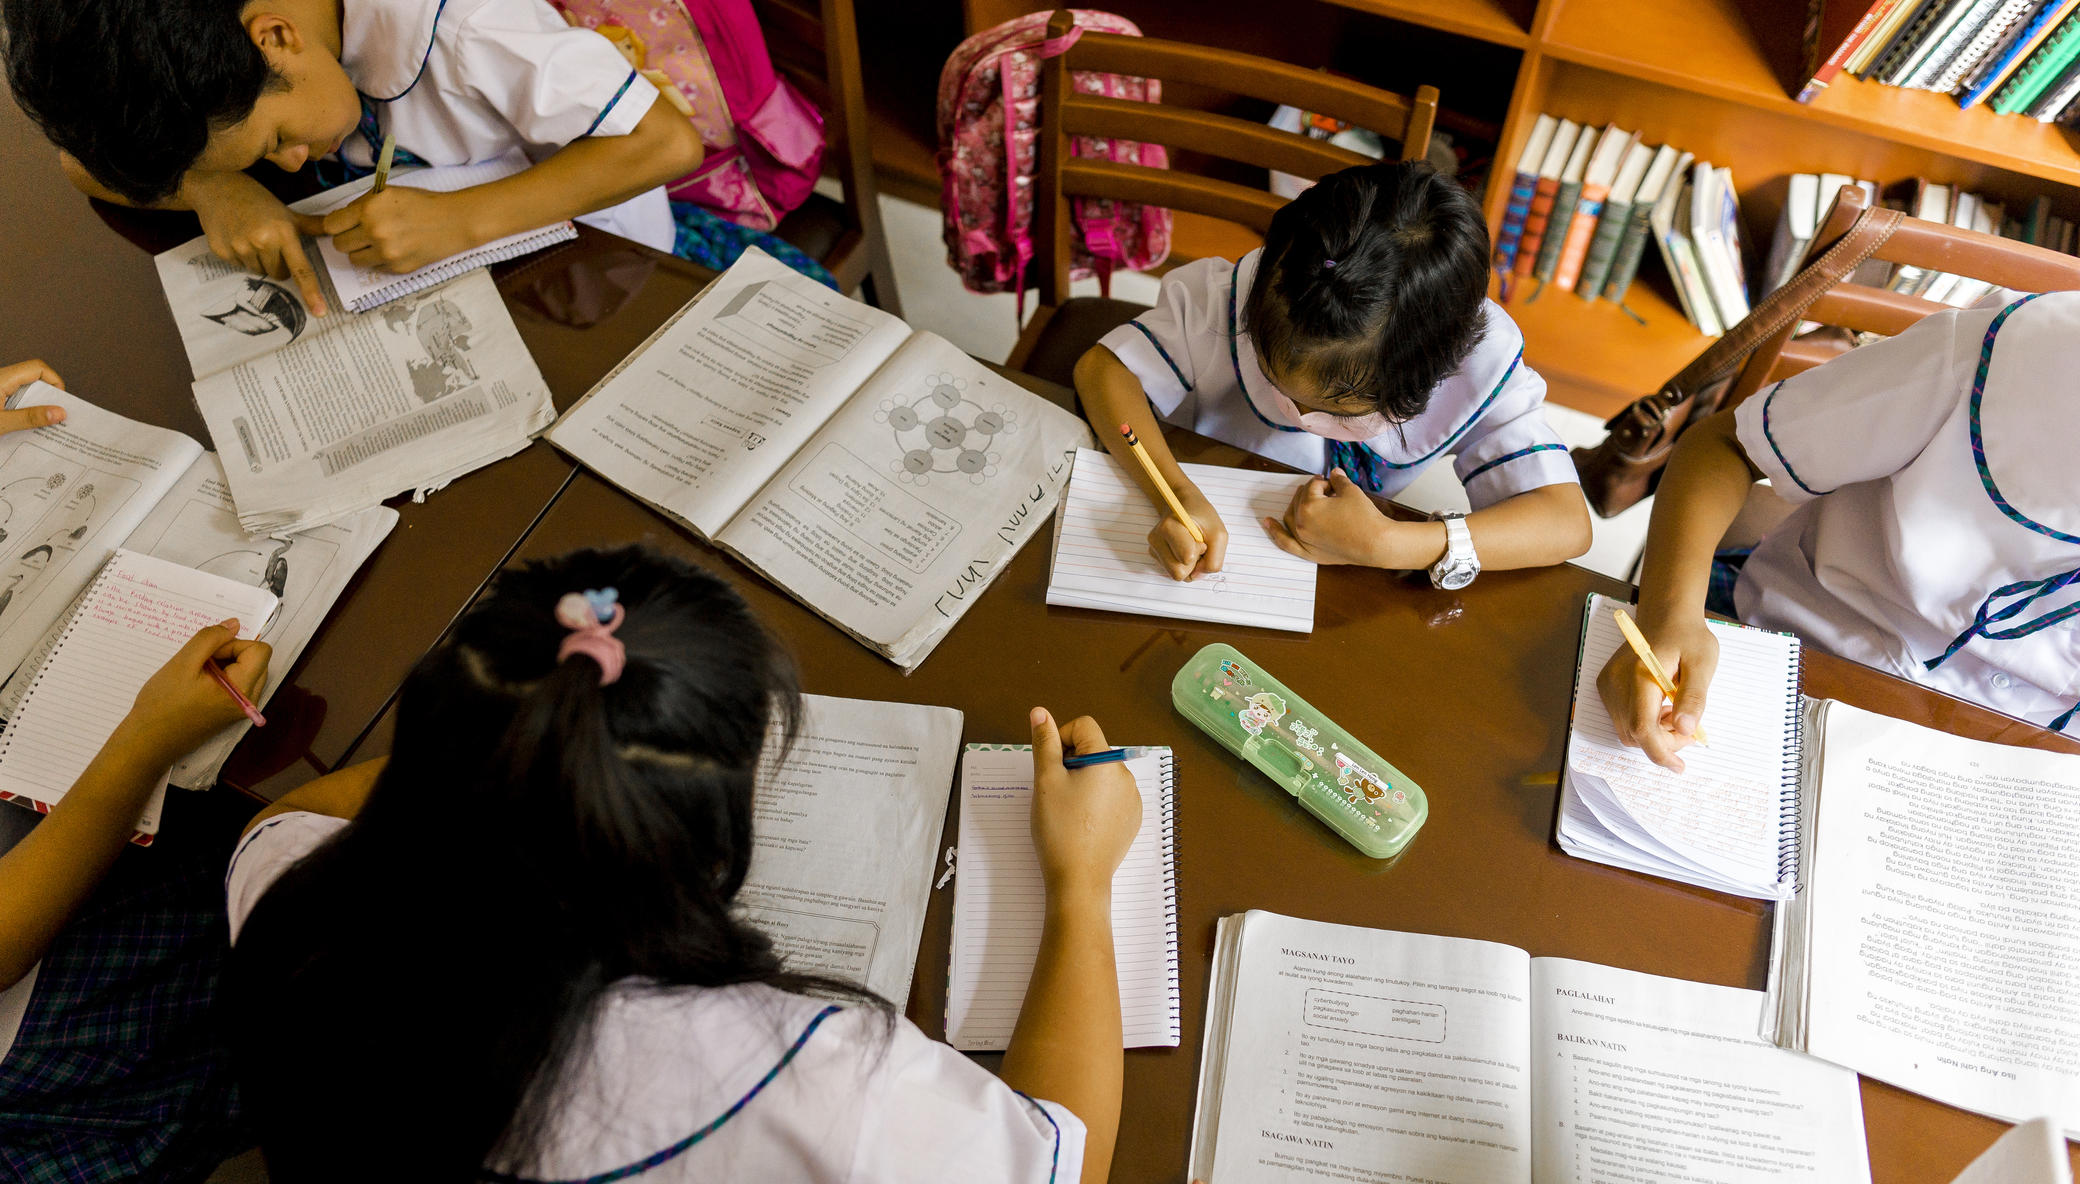 Empower Filipino teenage girl survivors of abuse